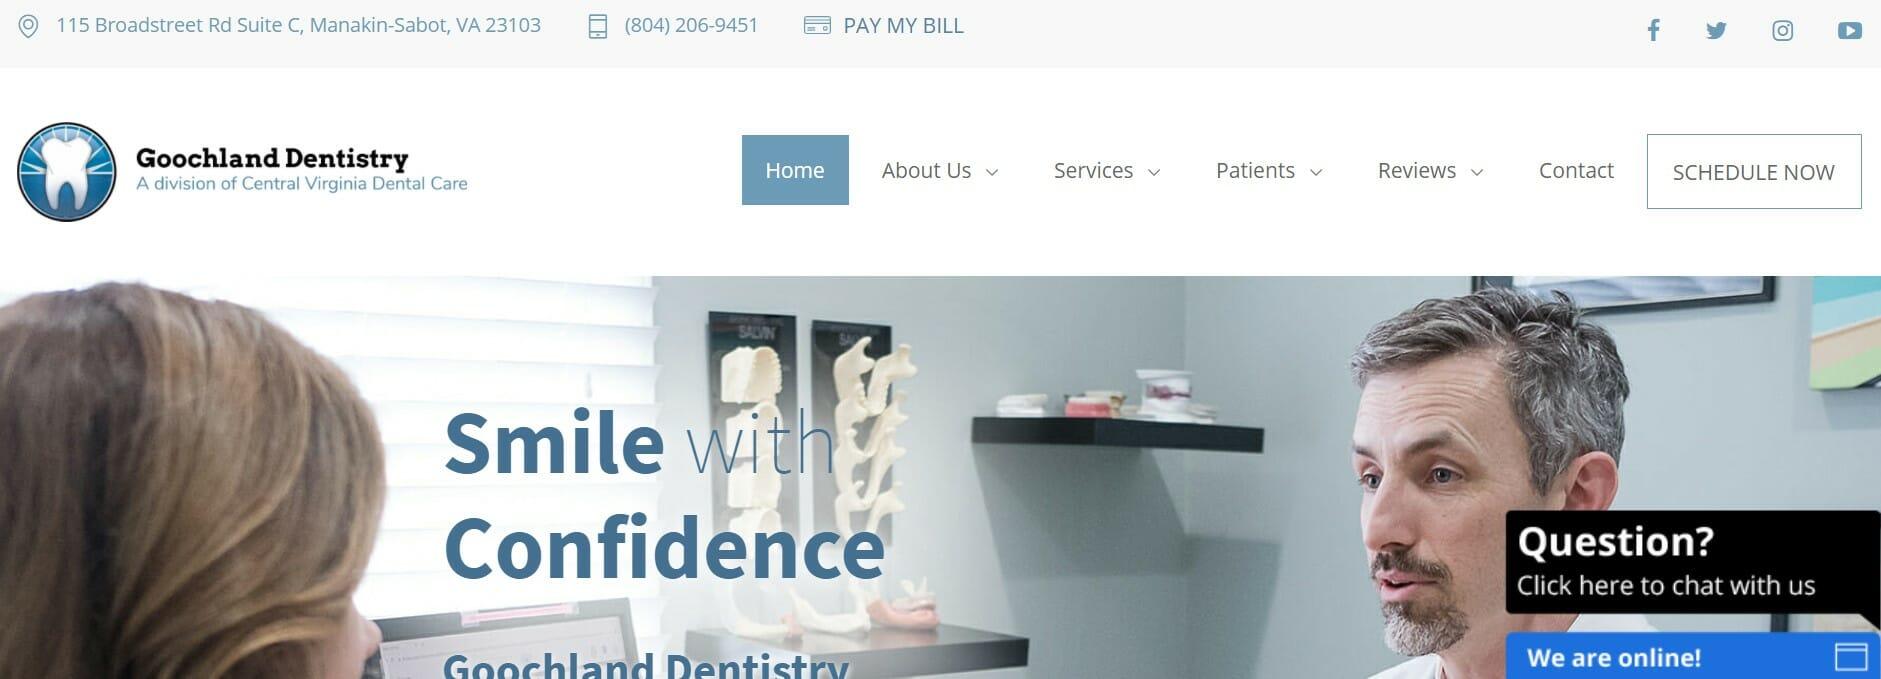 Live Website Chat on Goochland Dentistry's website